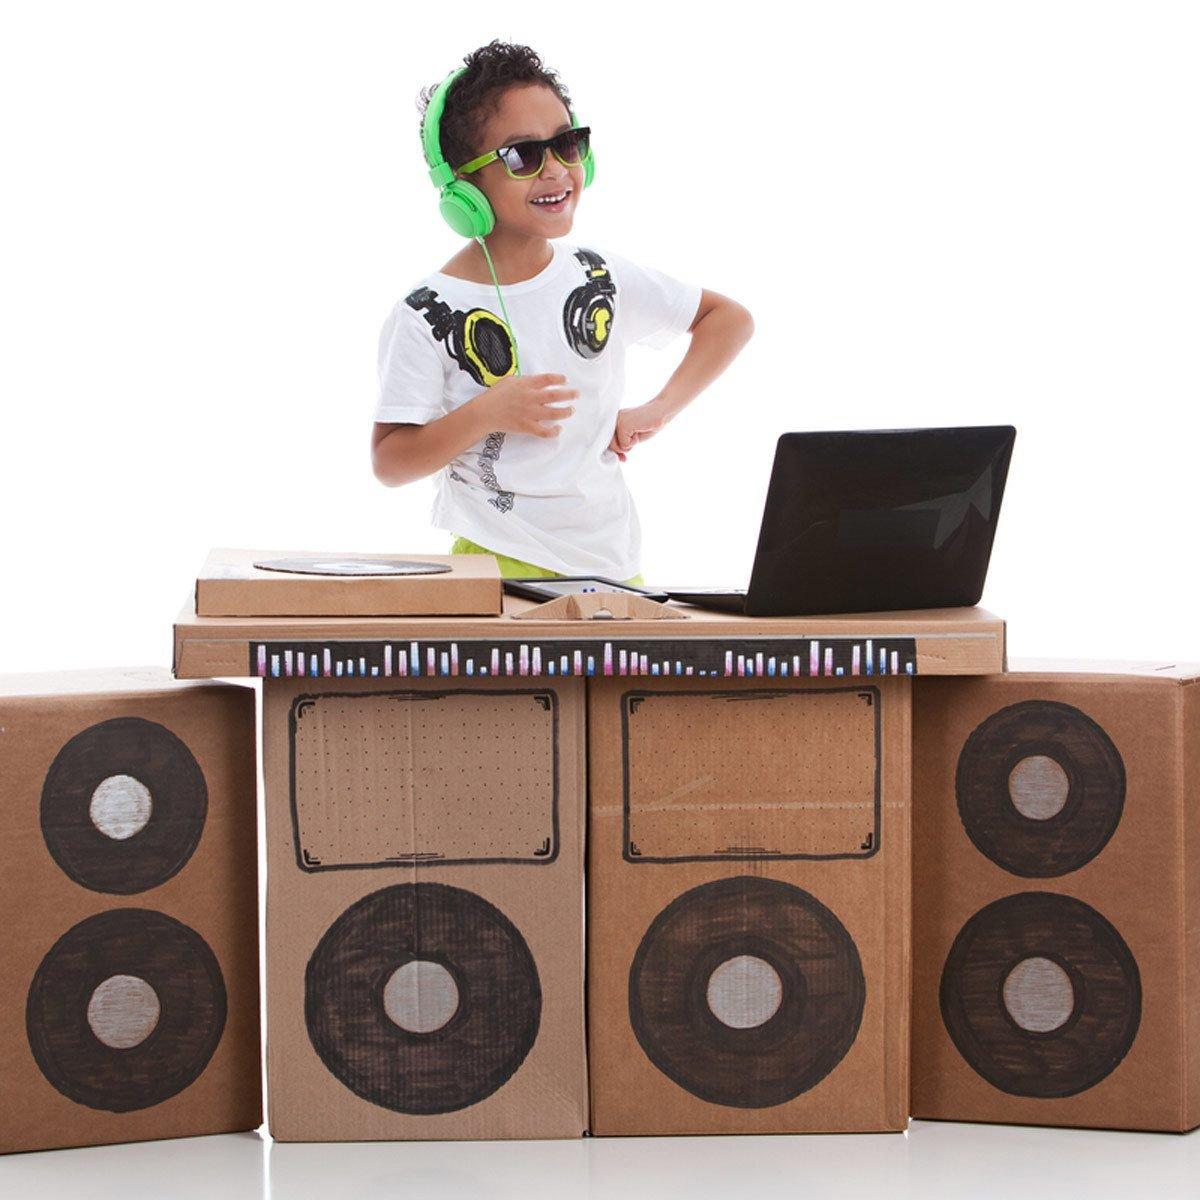 cardboard boxes play dj setup